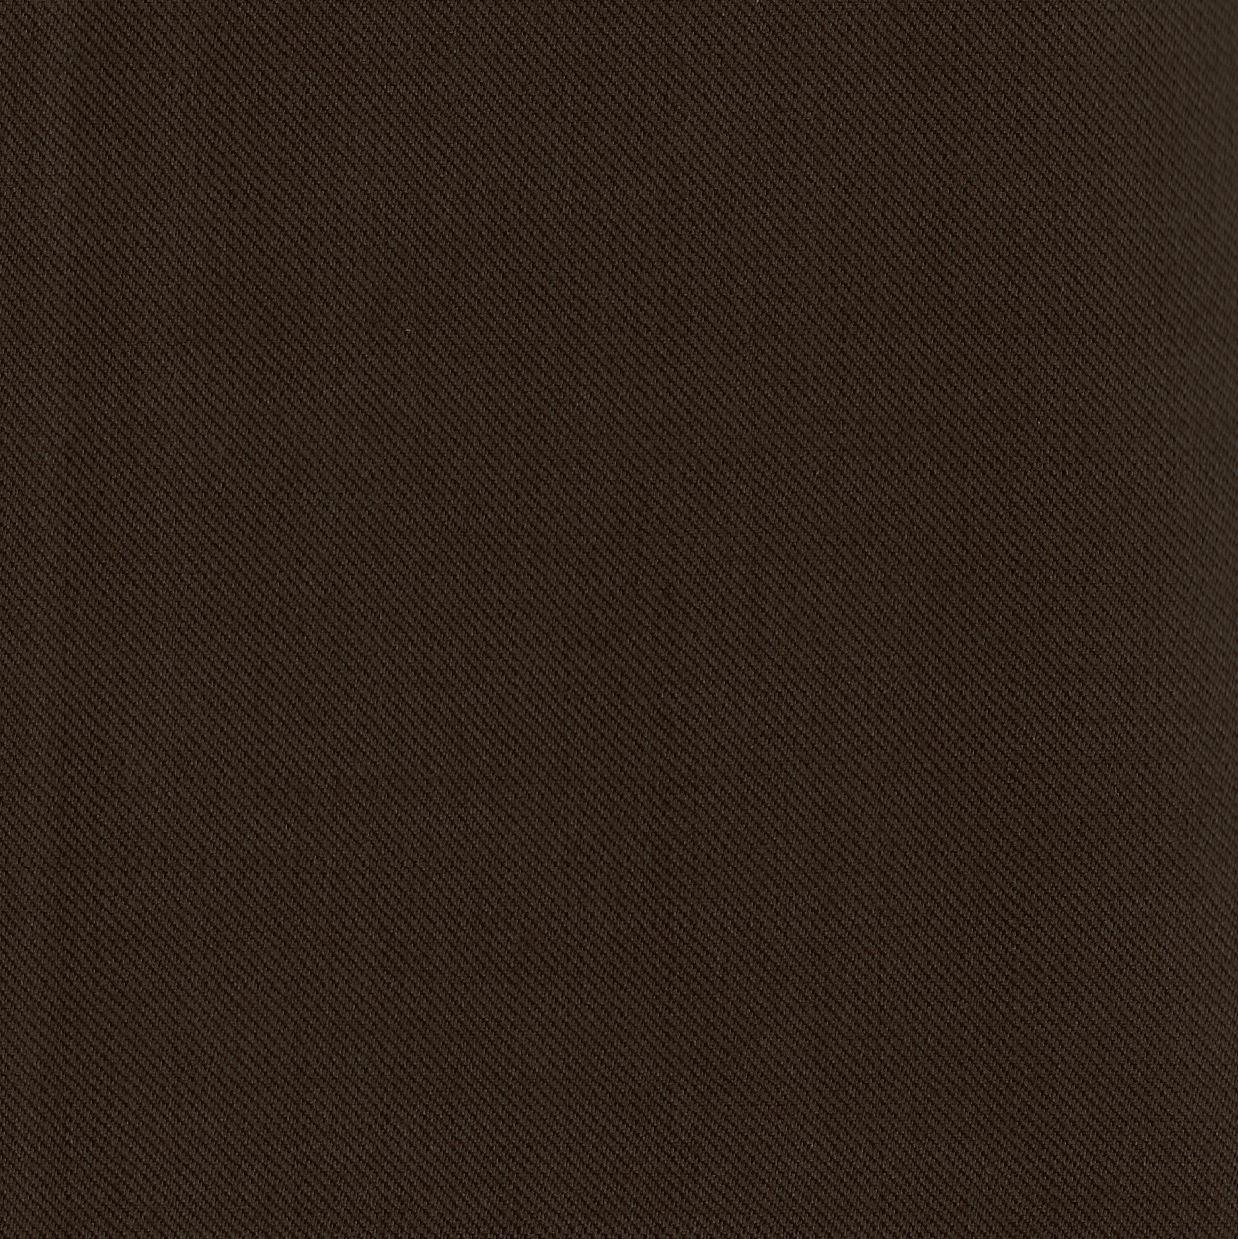 james hardinge super 110s pure wool plain brown